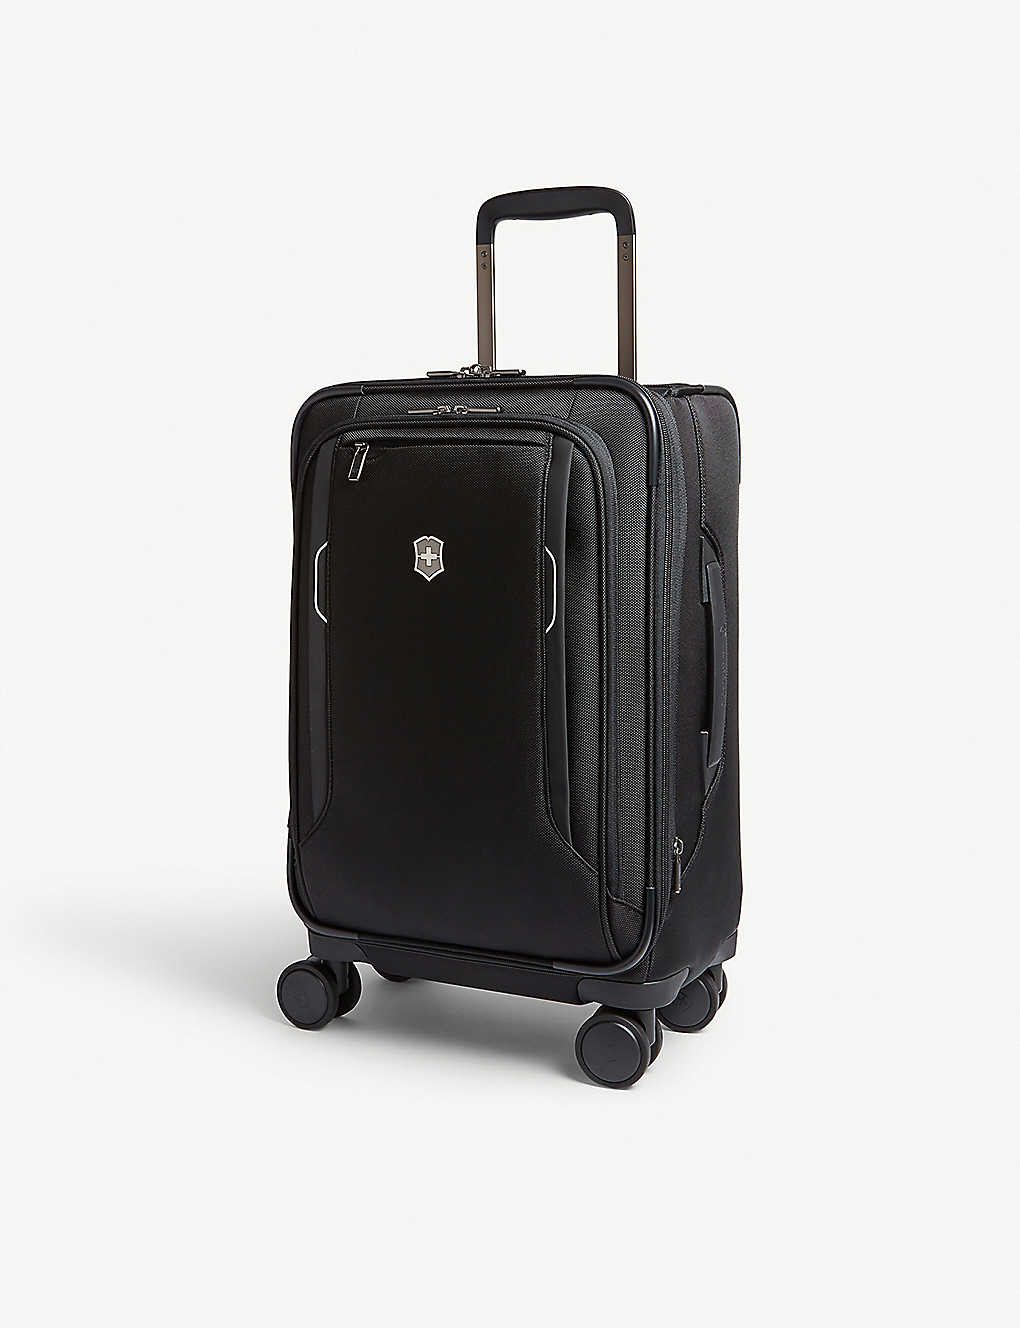 1b555c889 VICTORINOX - Werks Traveler 6.0 four-wheel suitcase 55cm ...